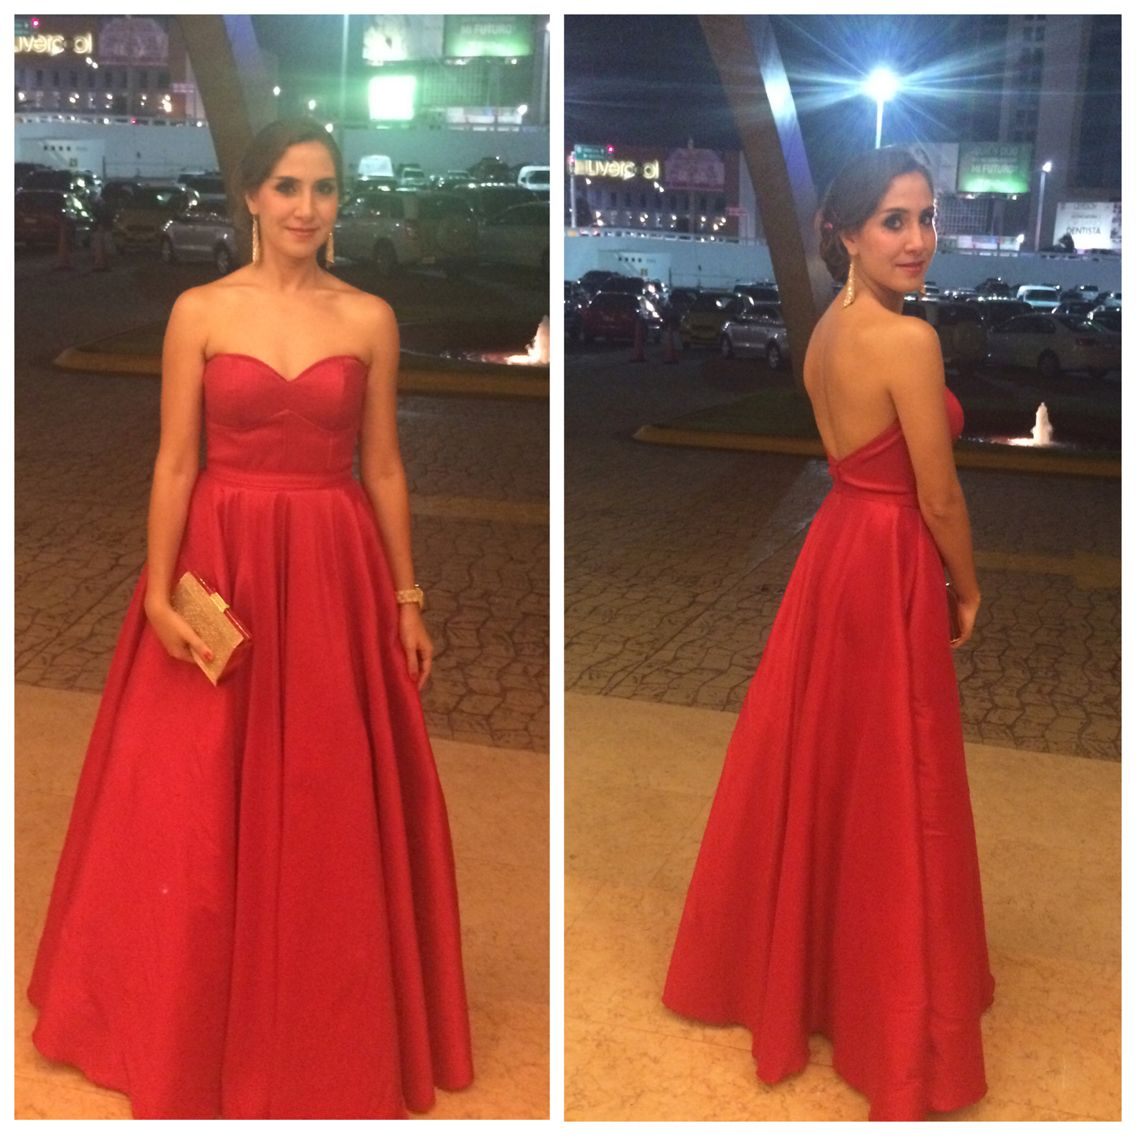 Elegant red dress with a little backless dresses i love